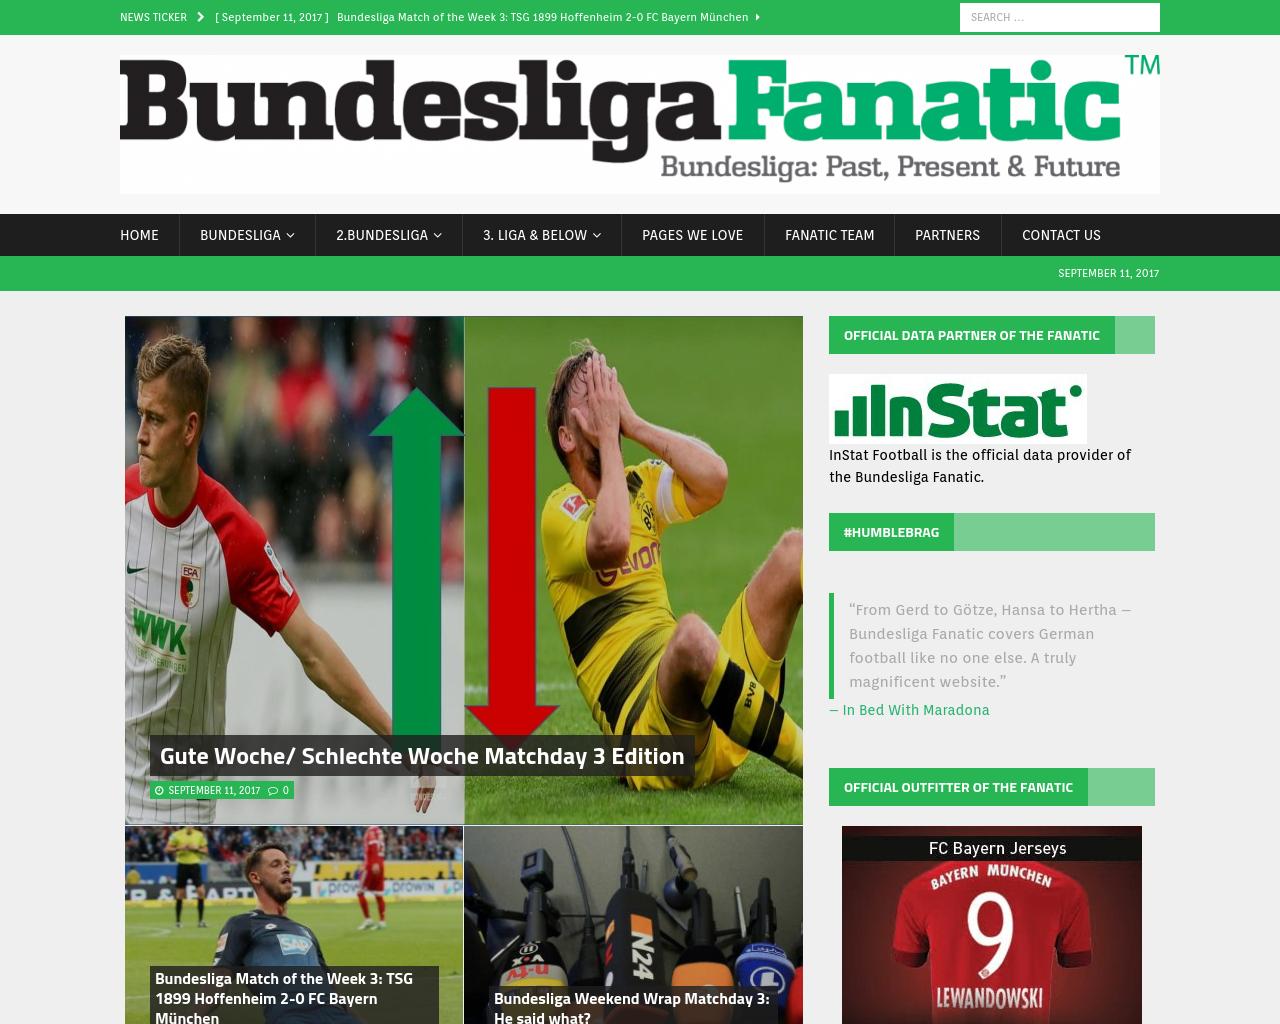 BundelisgaFanatic-Advertising-Reviews-Pricing